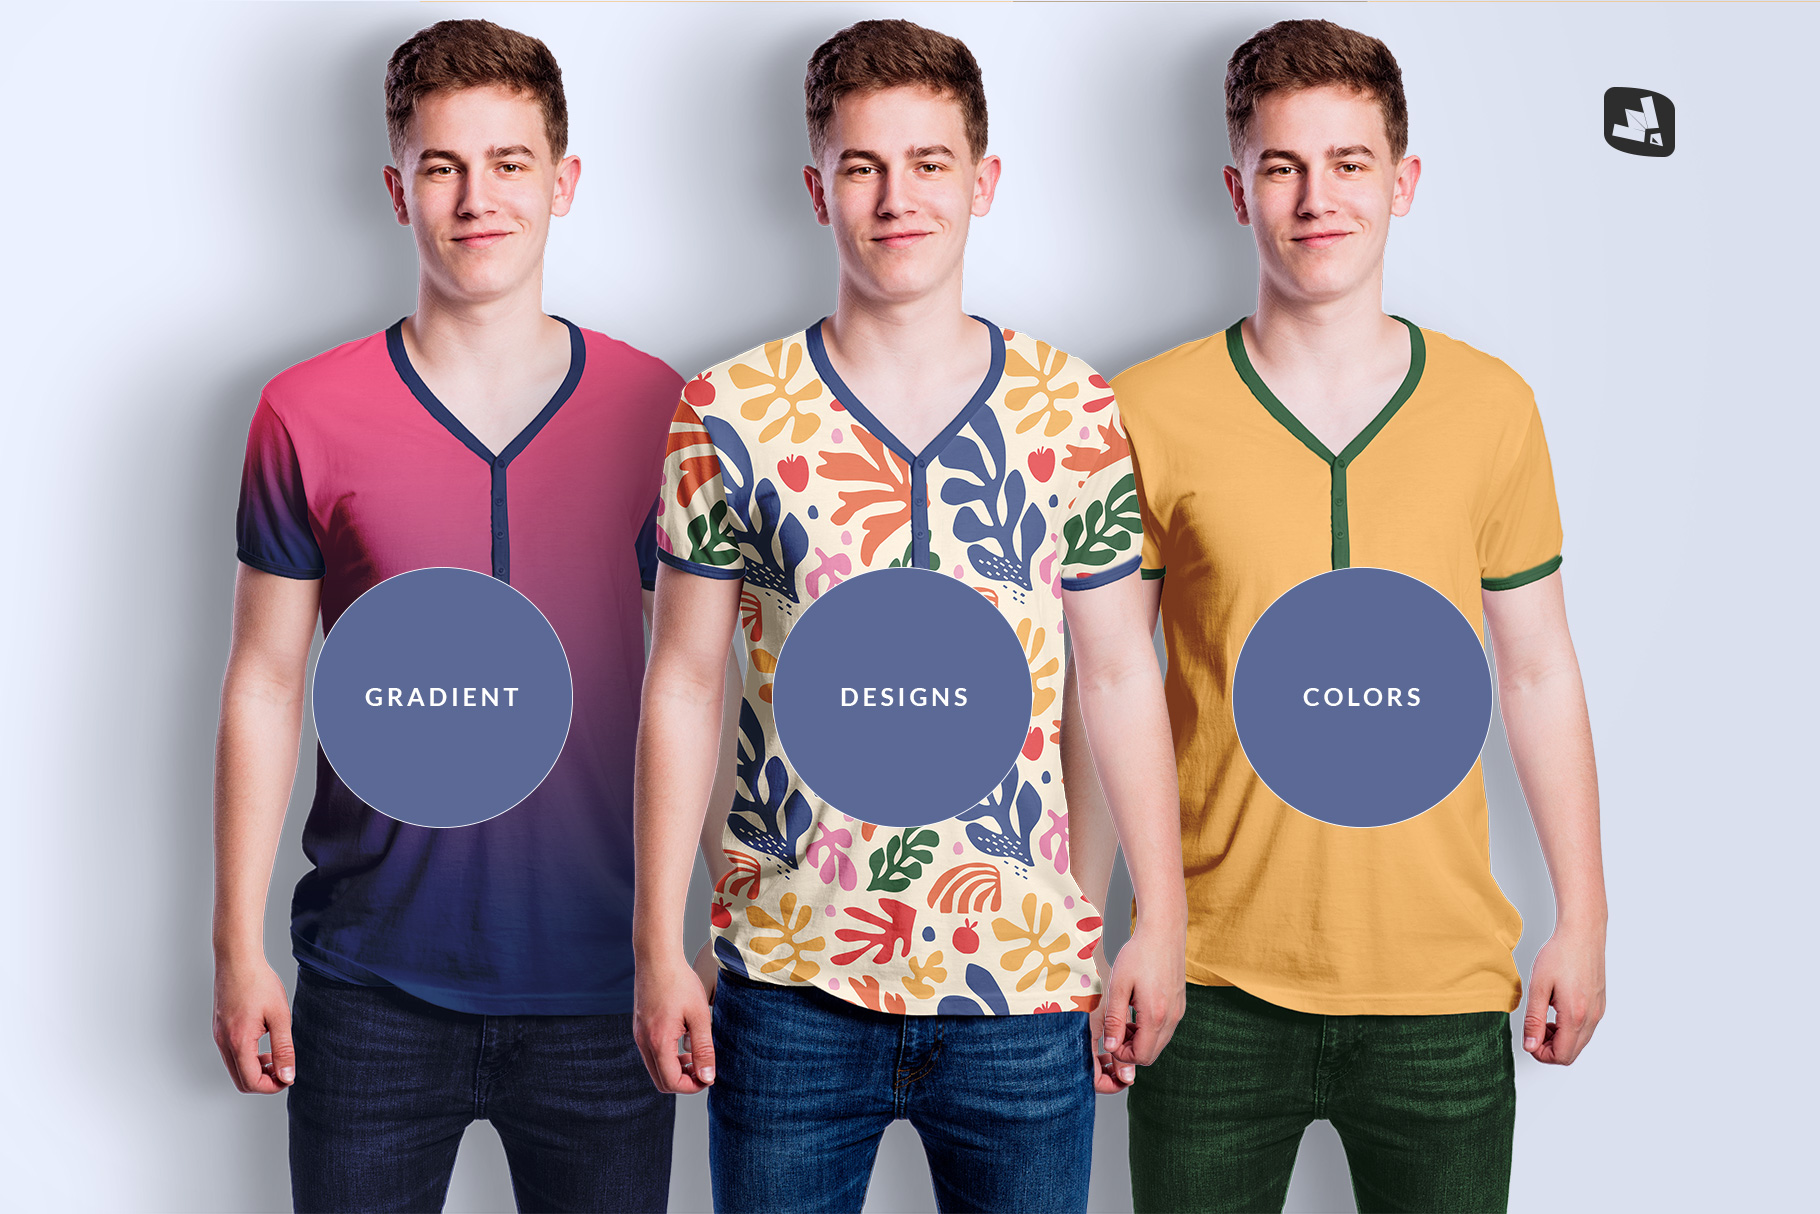 types of the mens vneck tshirt mockup